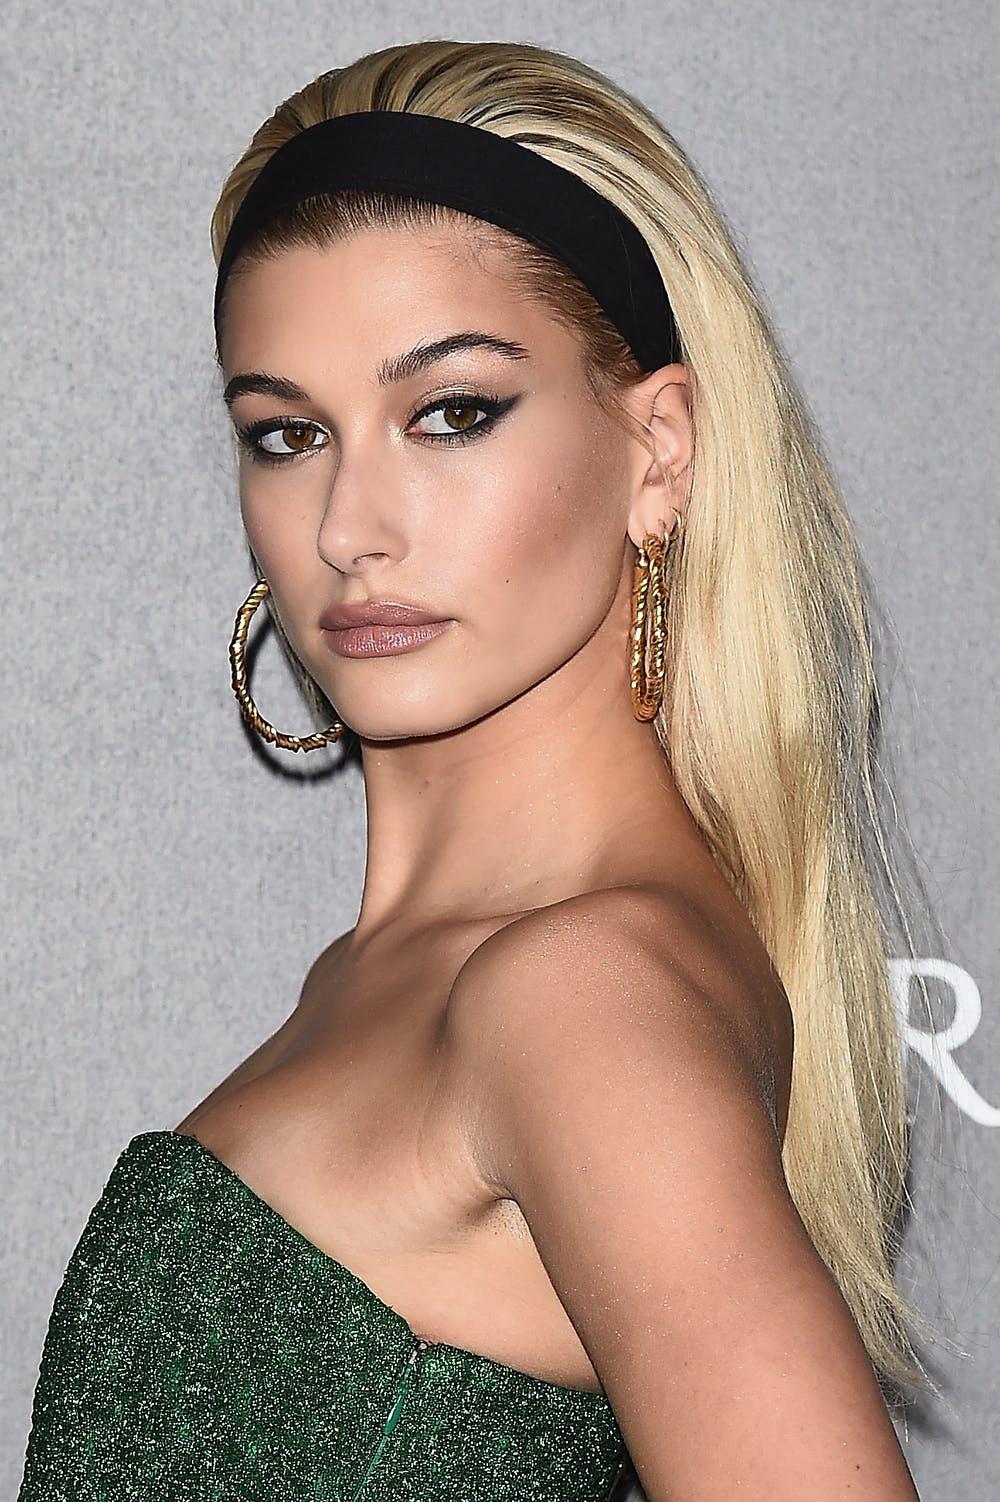 medium-how-to-style-hair-accessories-headbands-hairstyles-ways-to-wear-haileybaldwin-black-blonde-hoopearrings-retro.jpg